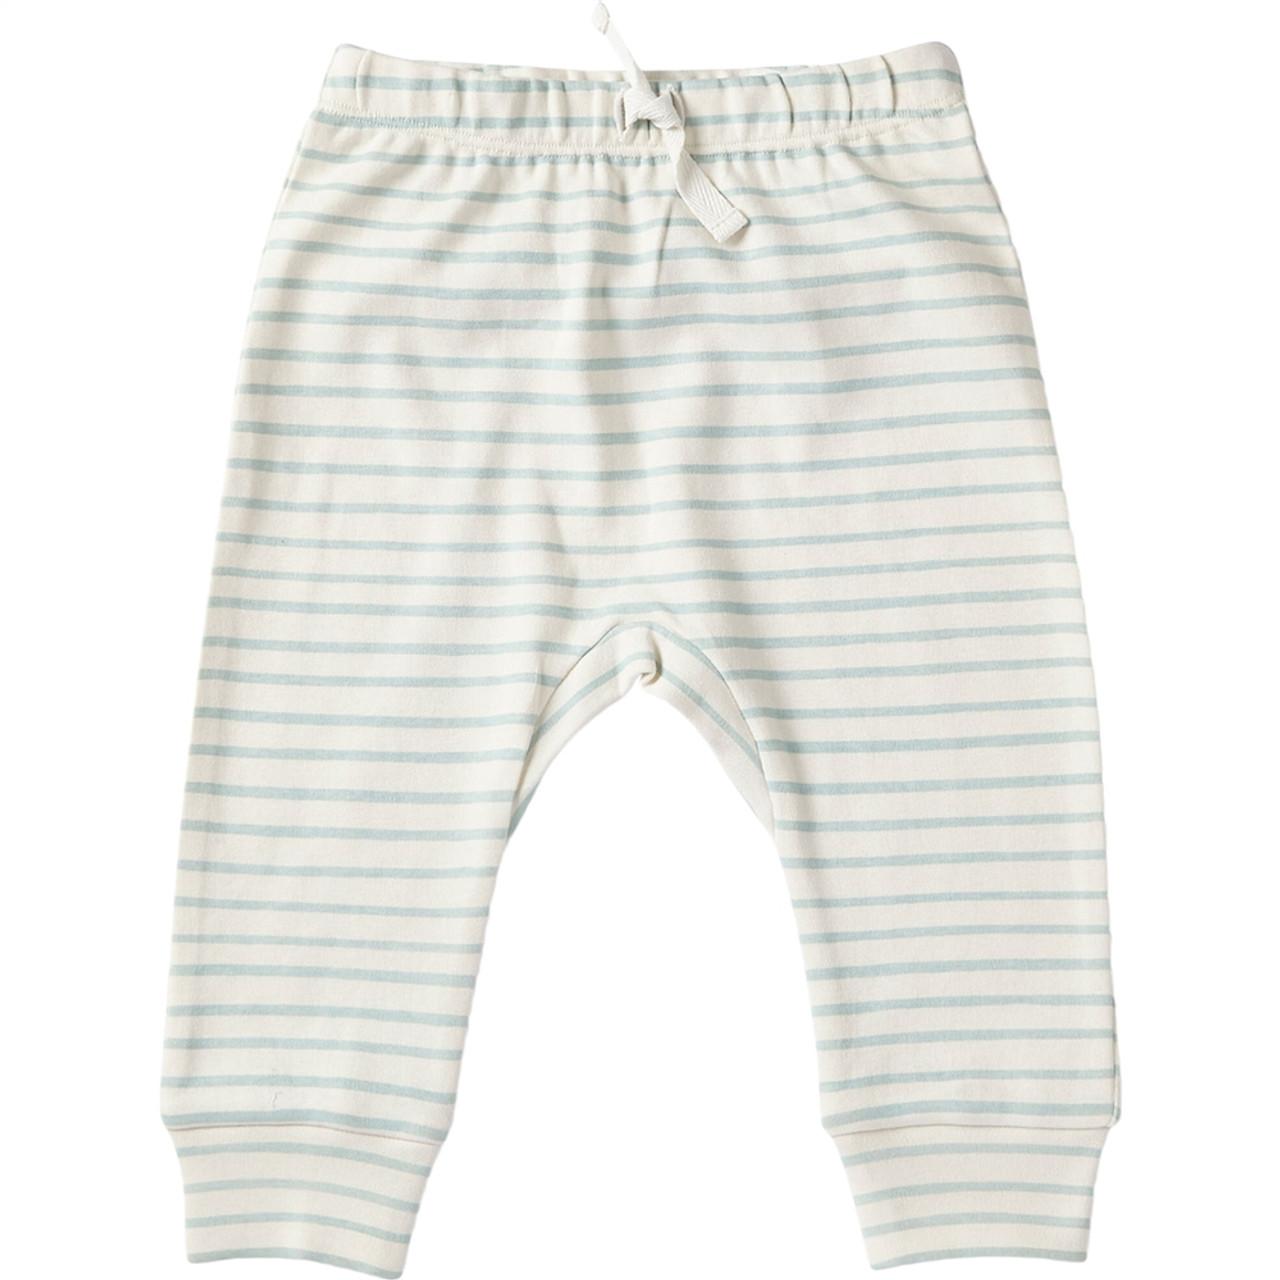 Organic Cotton Baby Harem Pants - Green Stripe, 0-3m